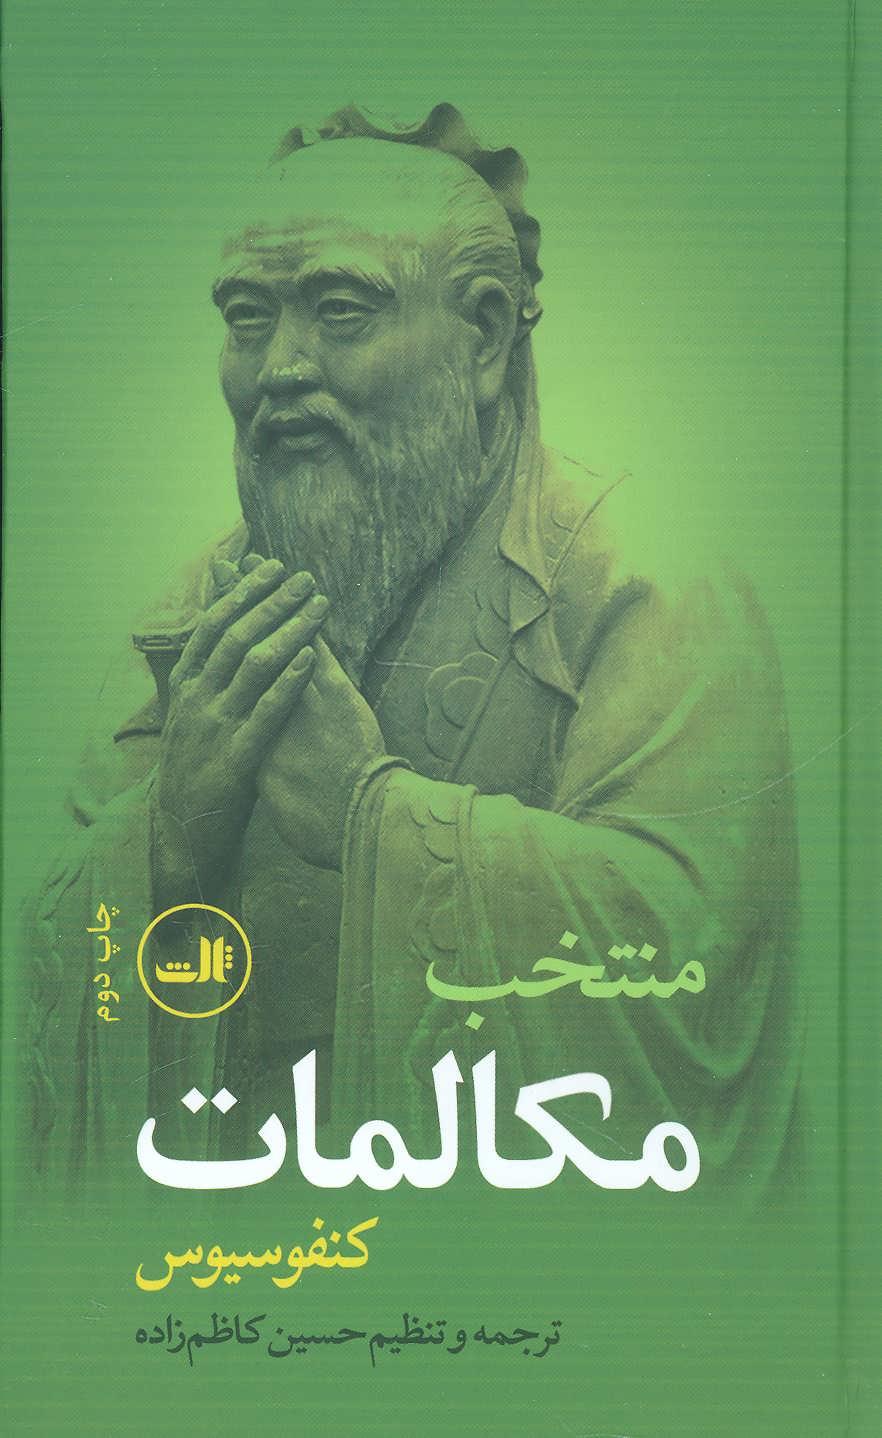 منتخب مکالمات کنفوسیوس